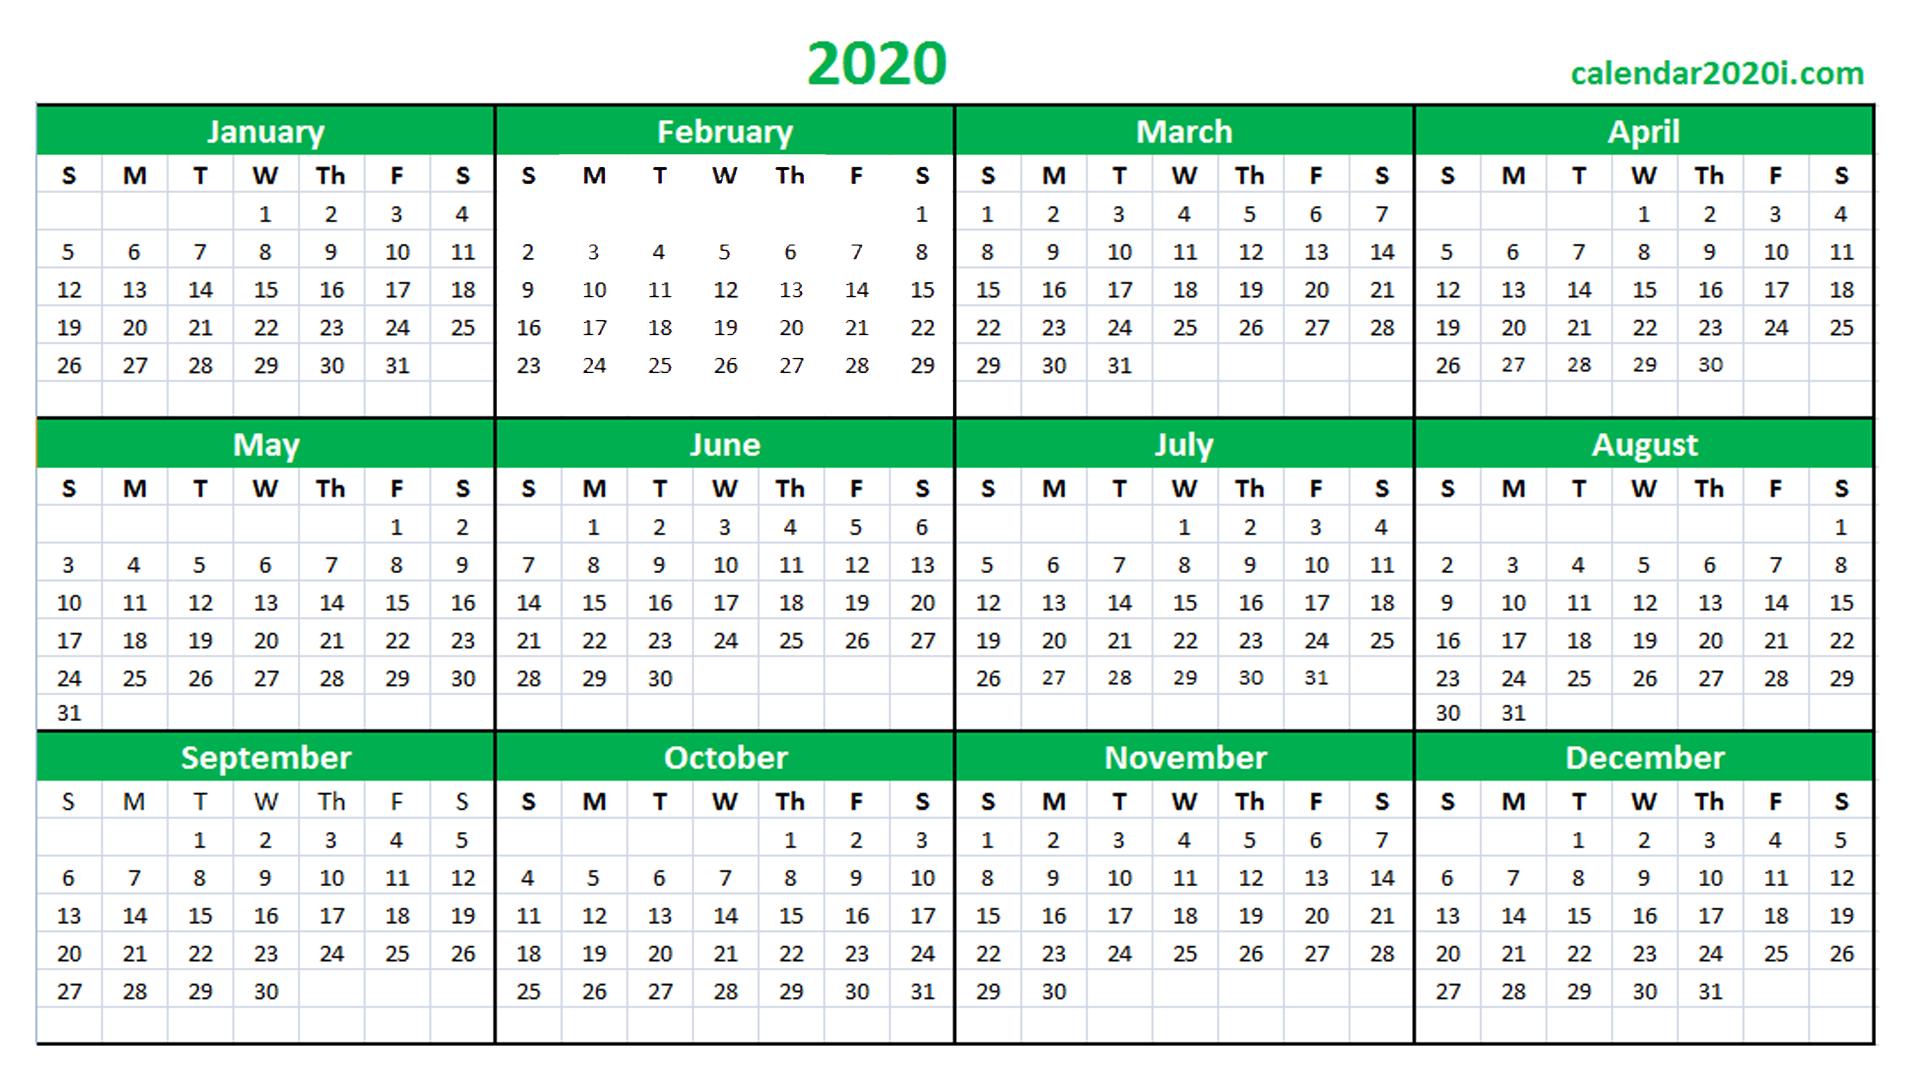 2020 Calendar Printable Template Holidays, Word, Excel Calendars I Can Edit